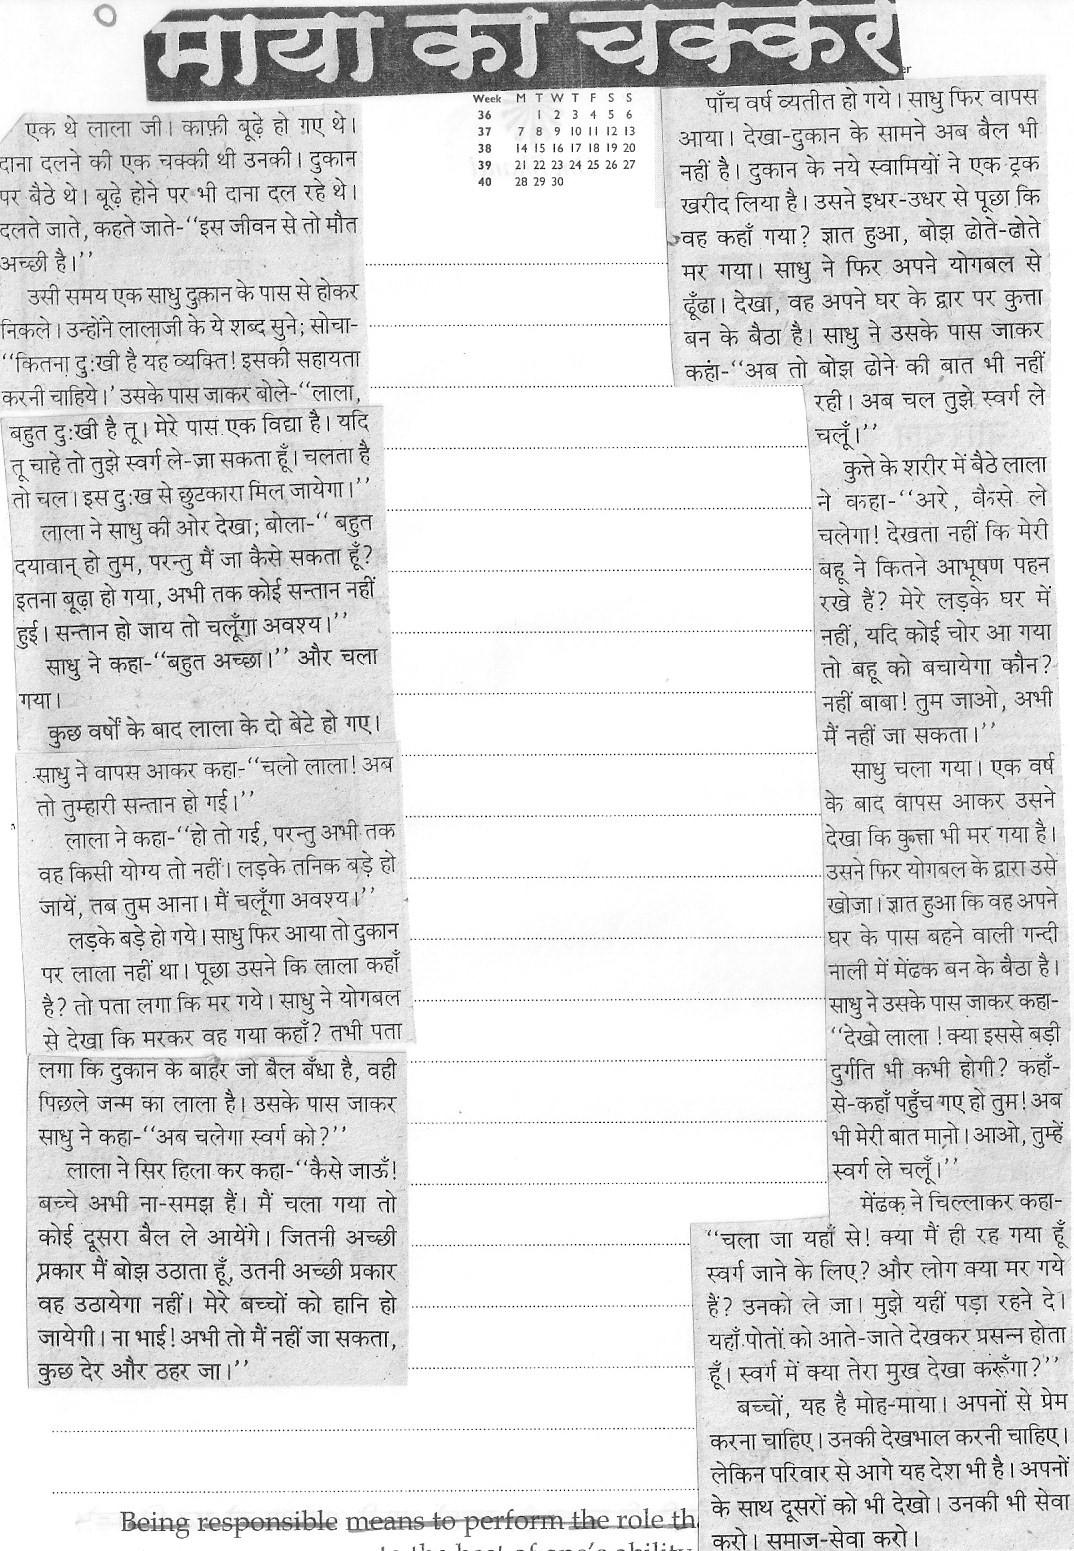 Essay on shram ka mahatva in marathi